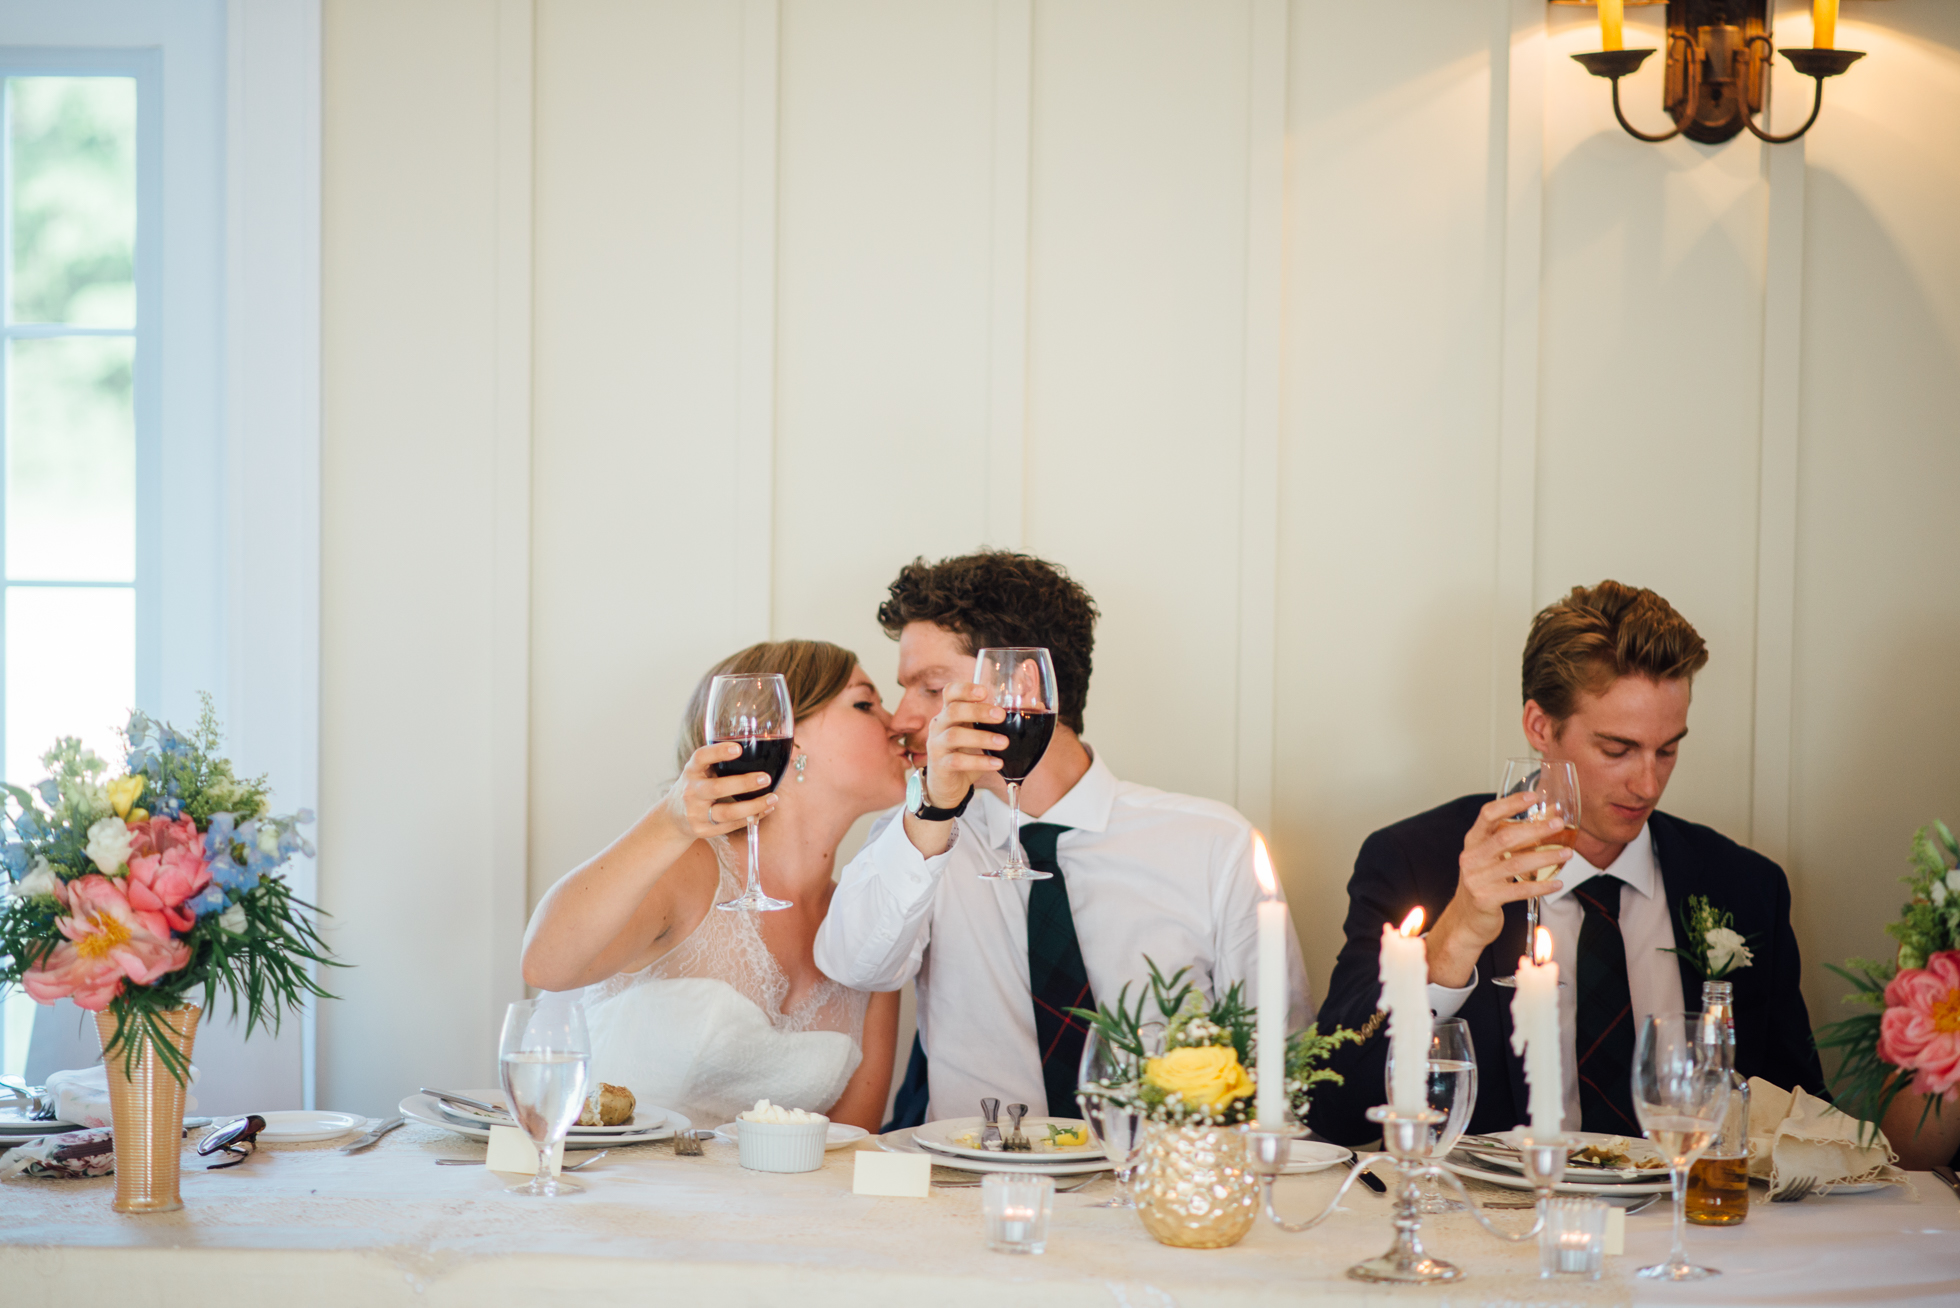 Outdoor-Caledon-Tralee-Wedding-Photography-94